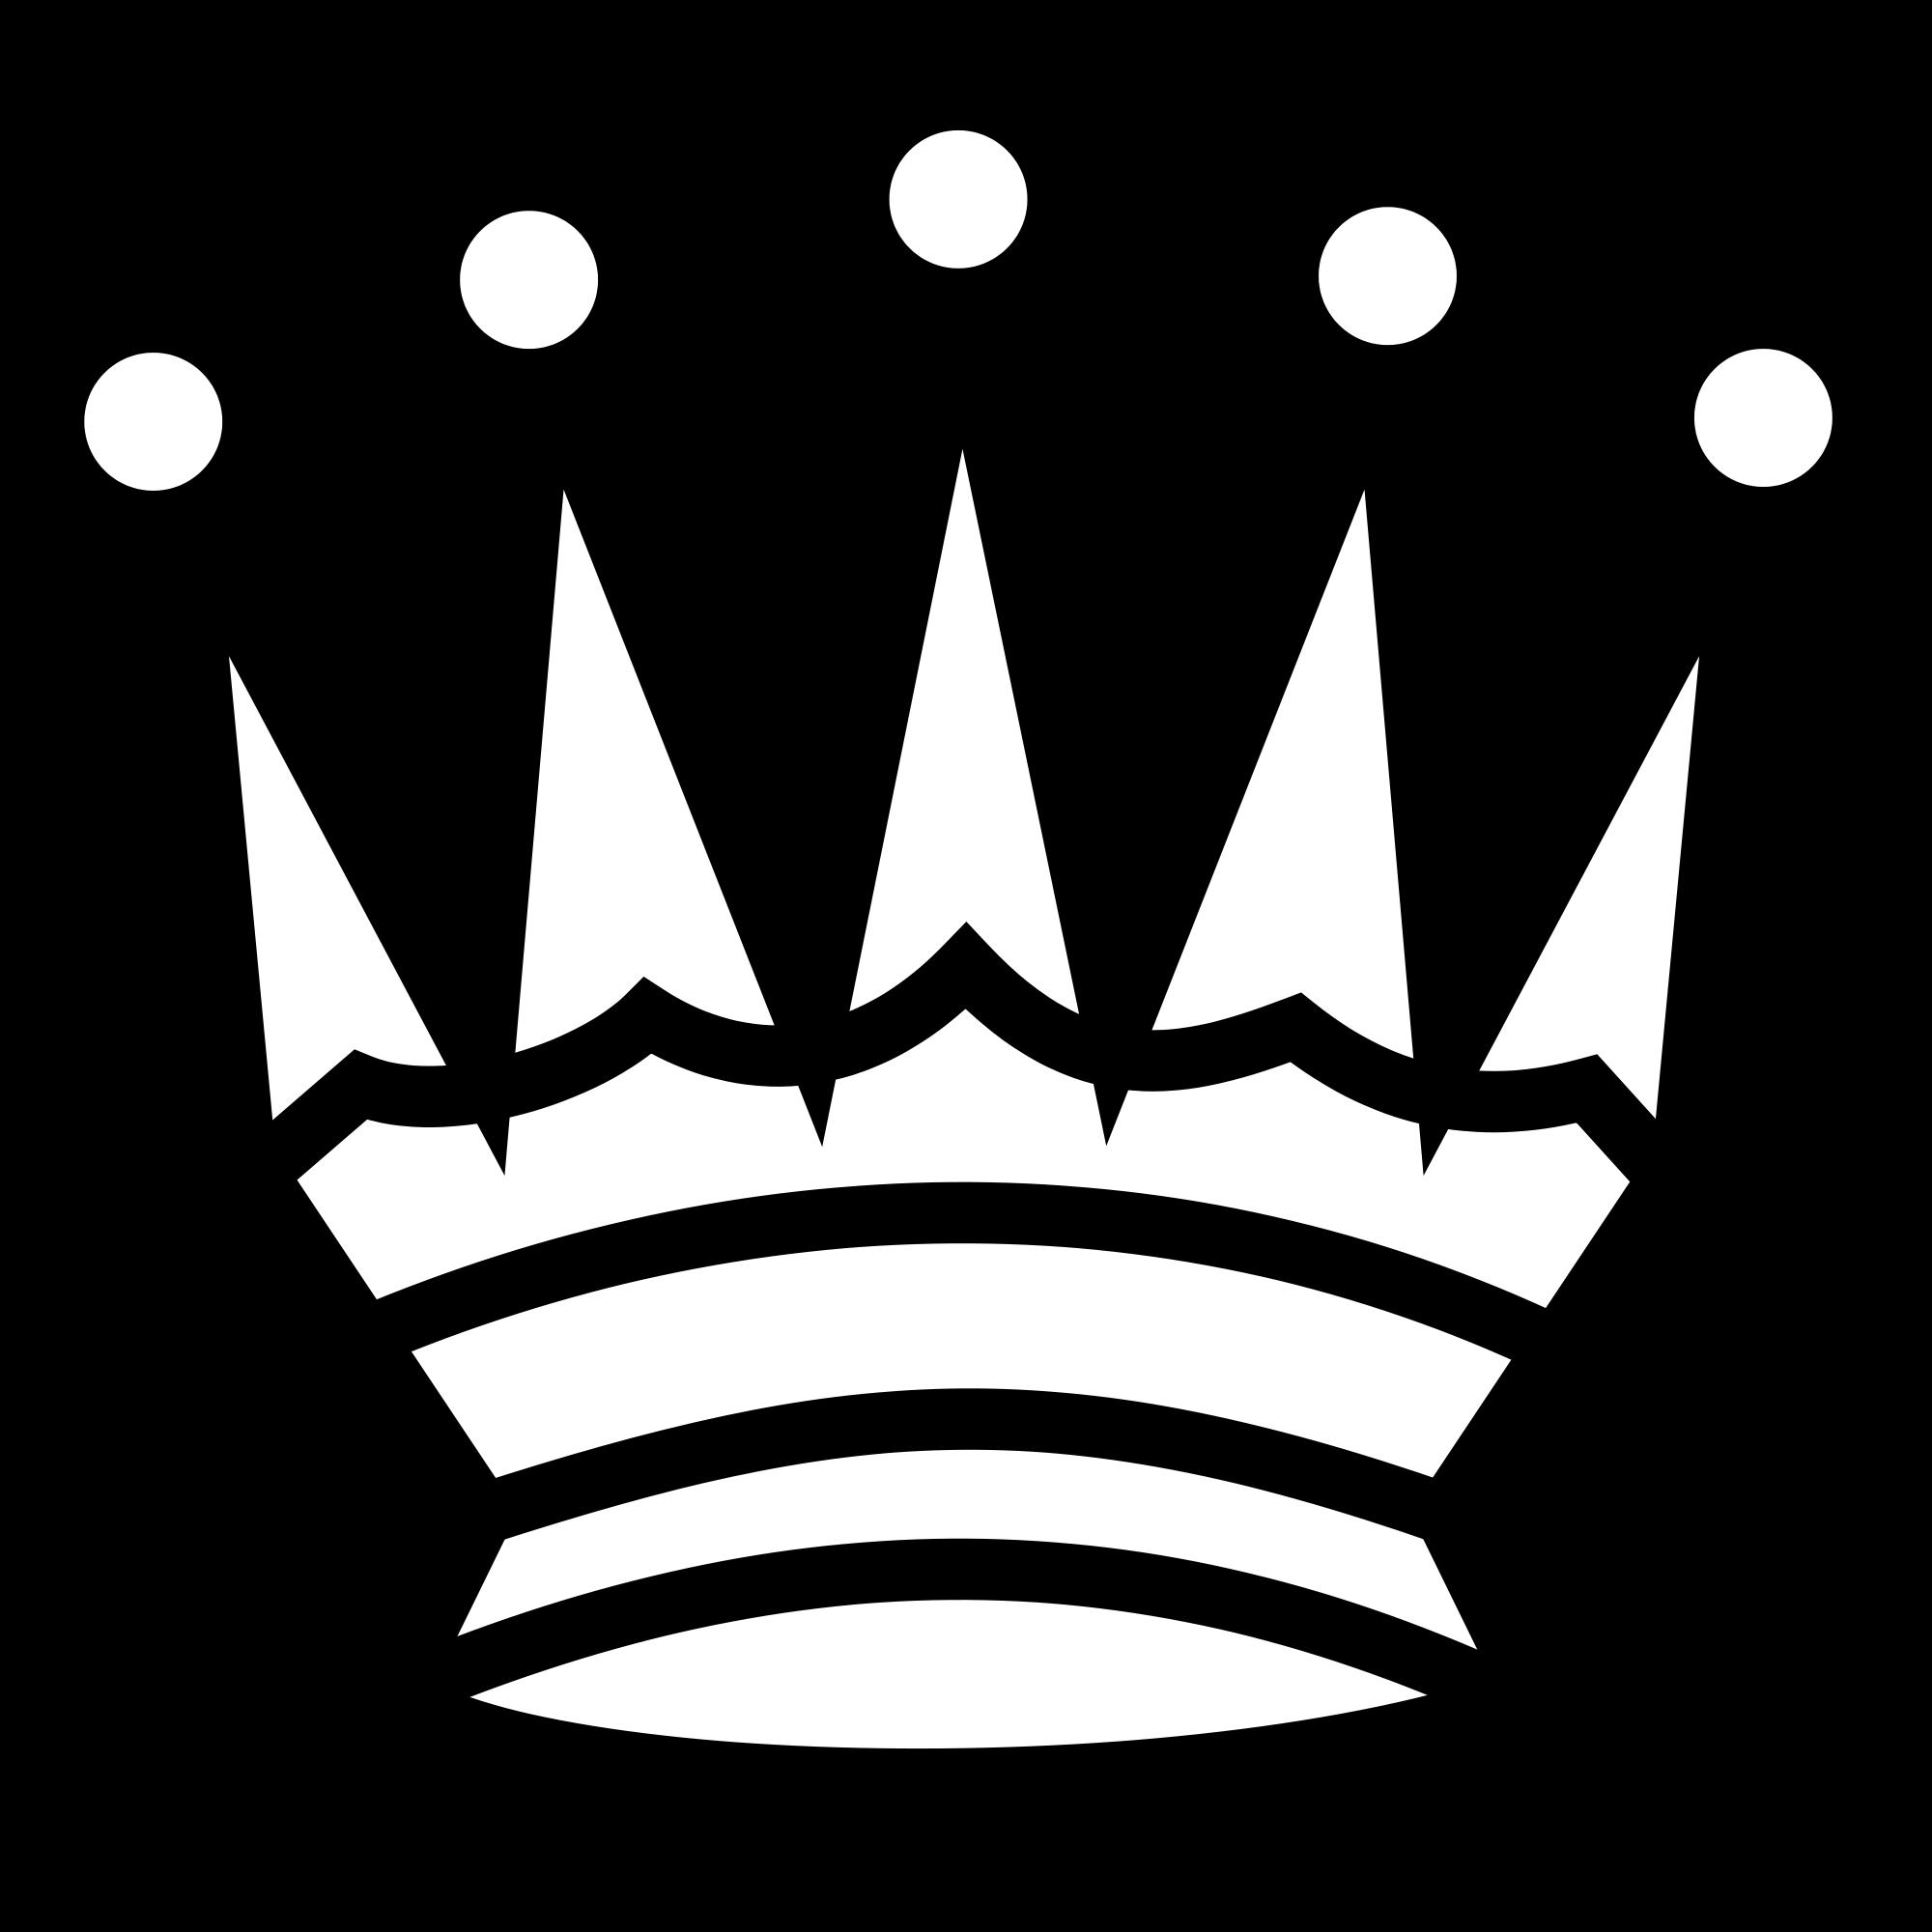 Queen PNG Transparent Queen.PNG Images..